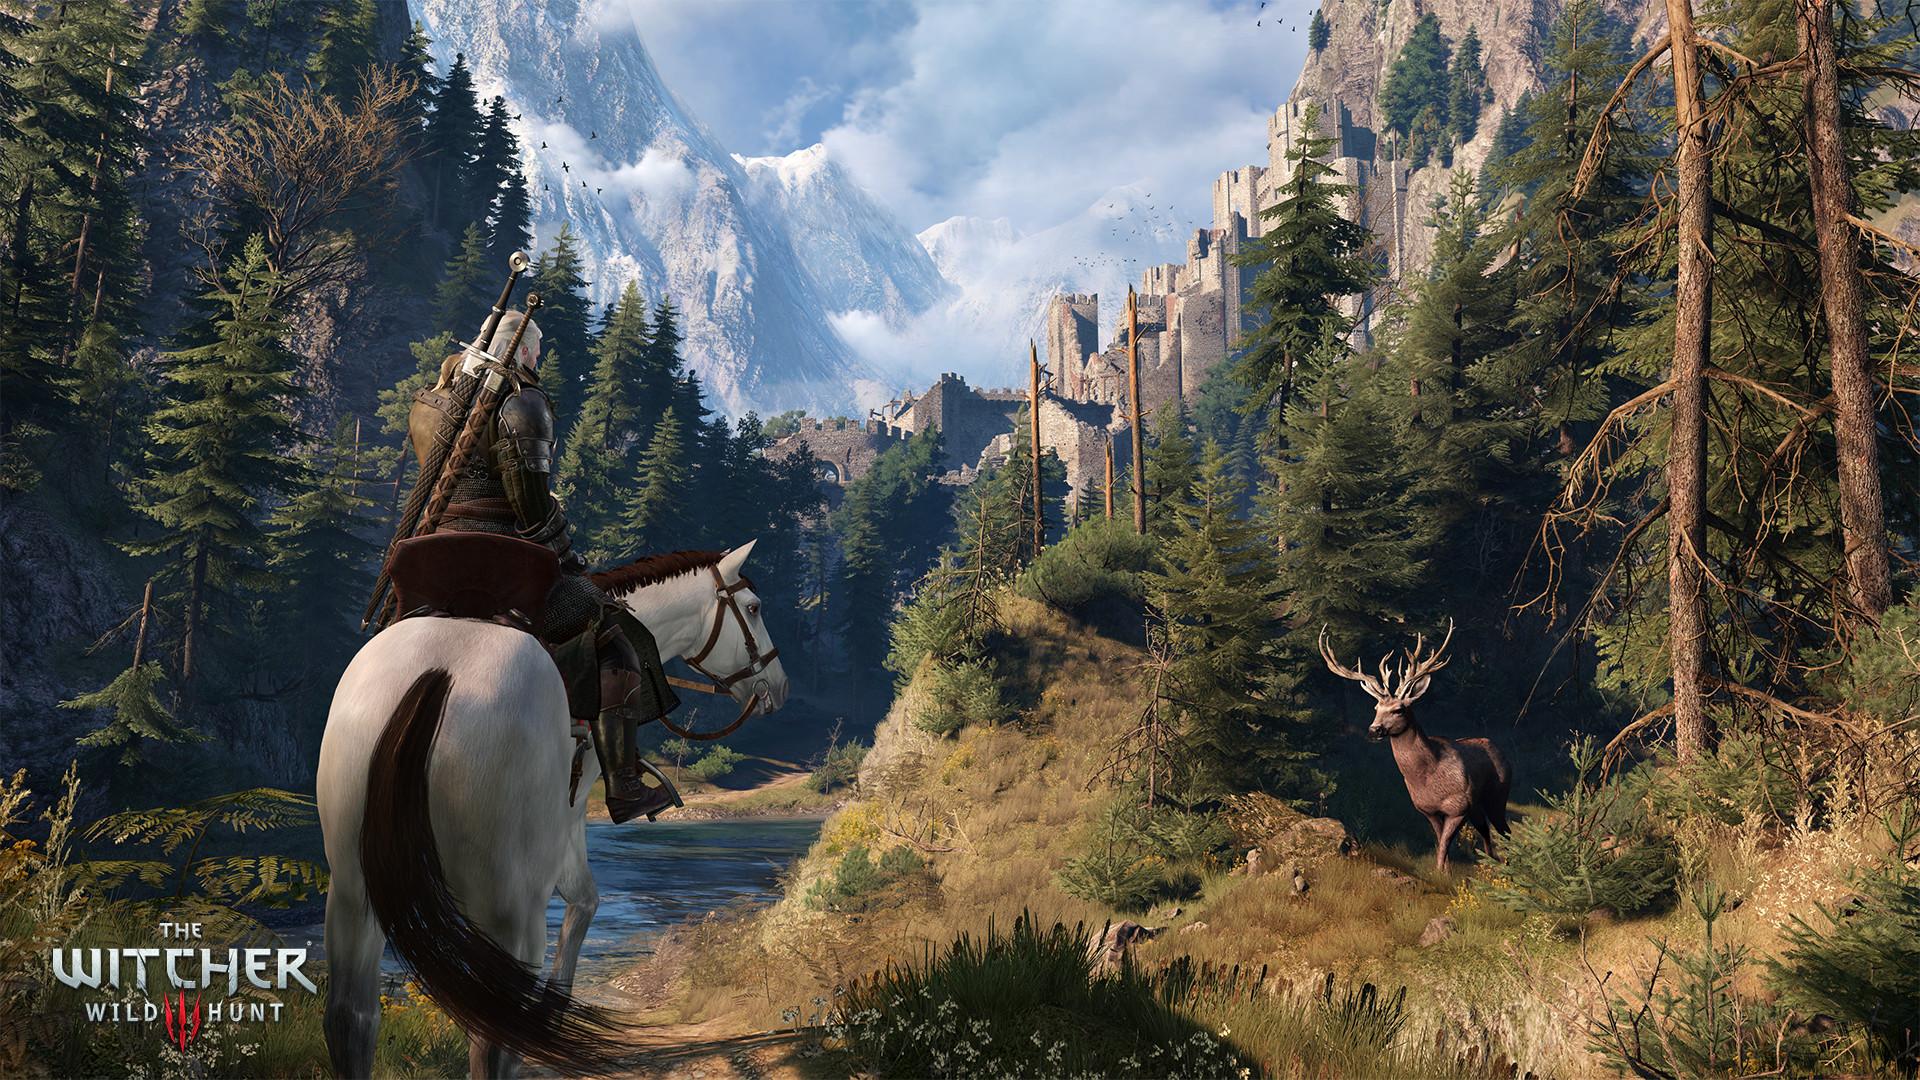 The Witcher 3 Wild Hunt Screenshot 3